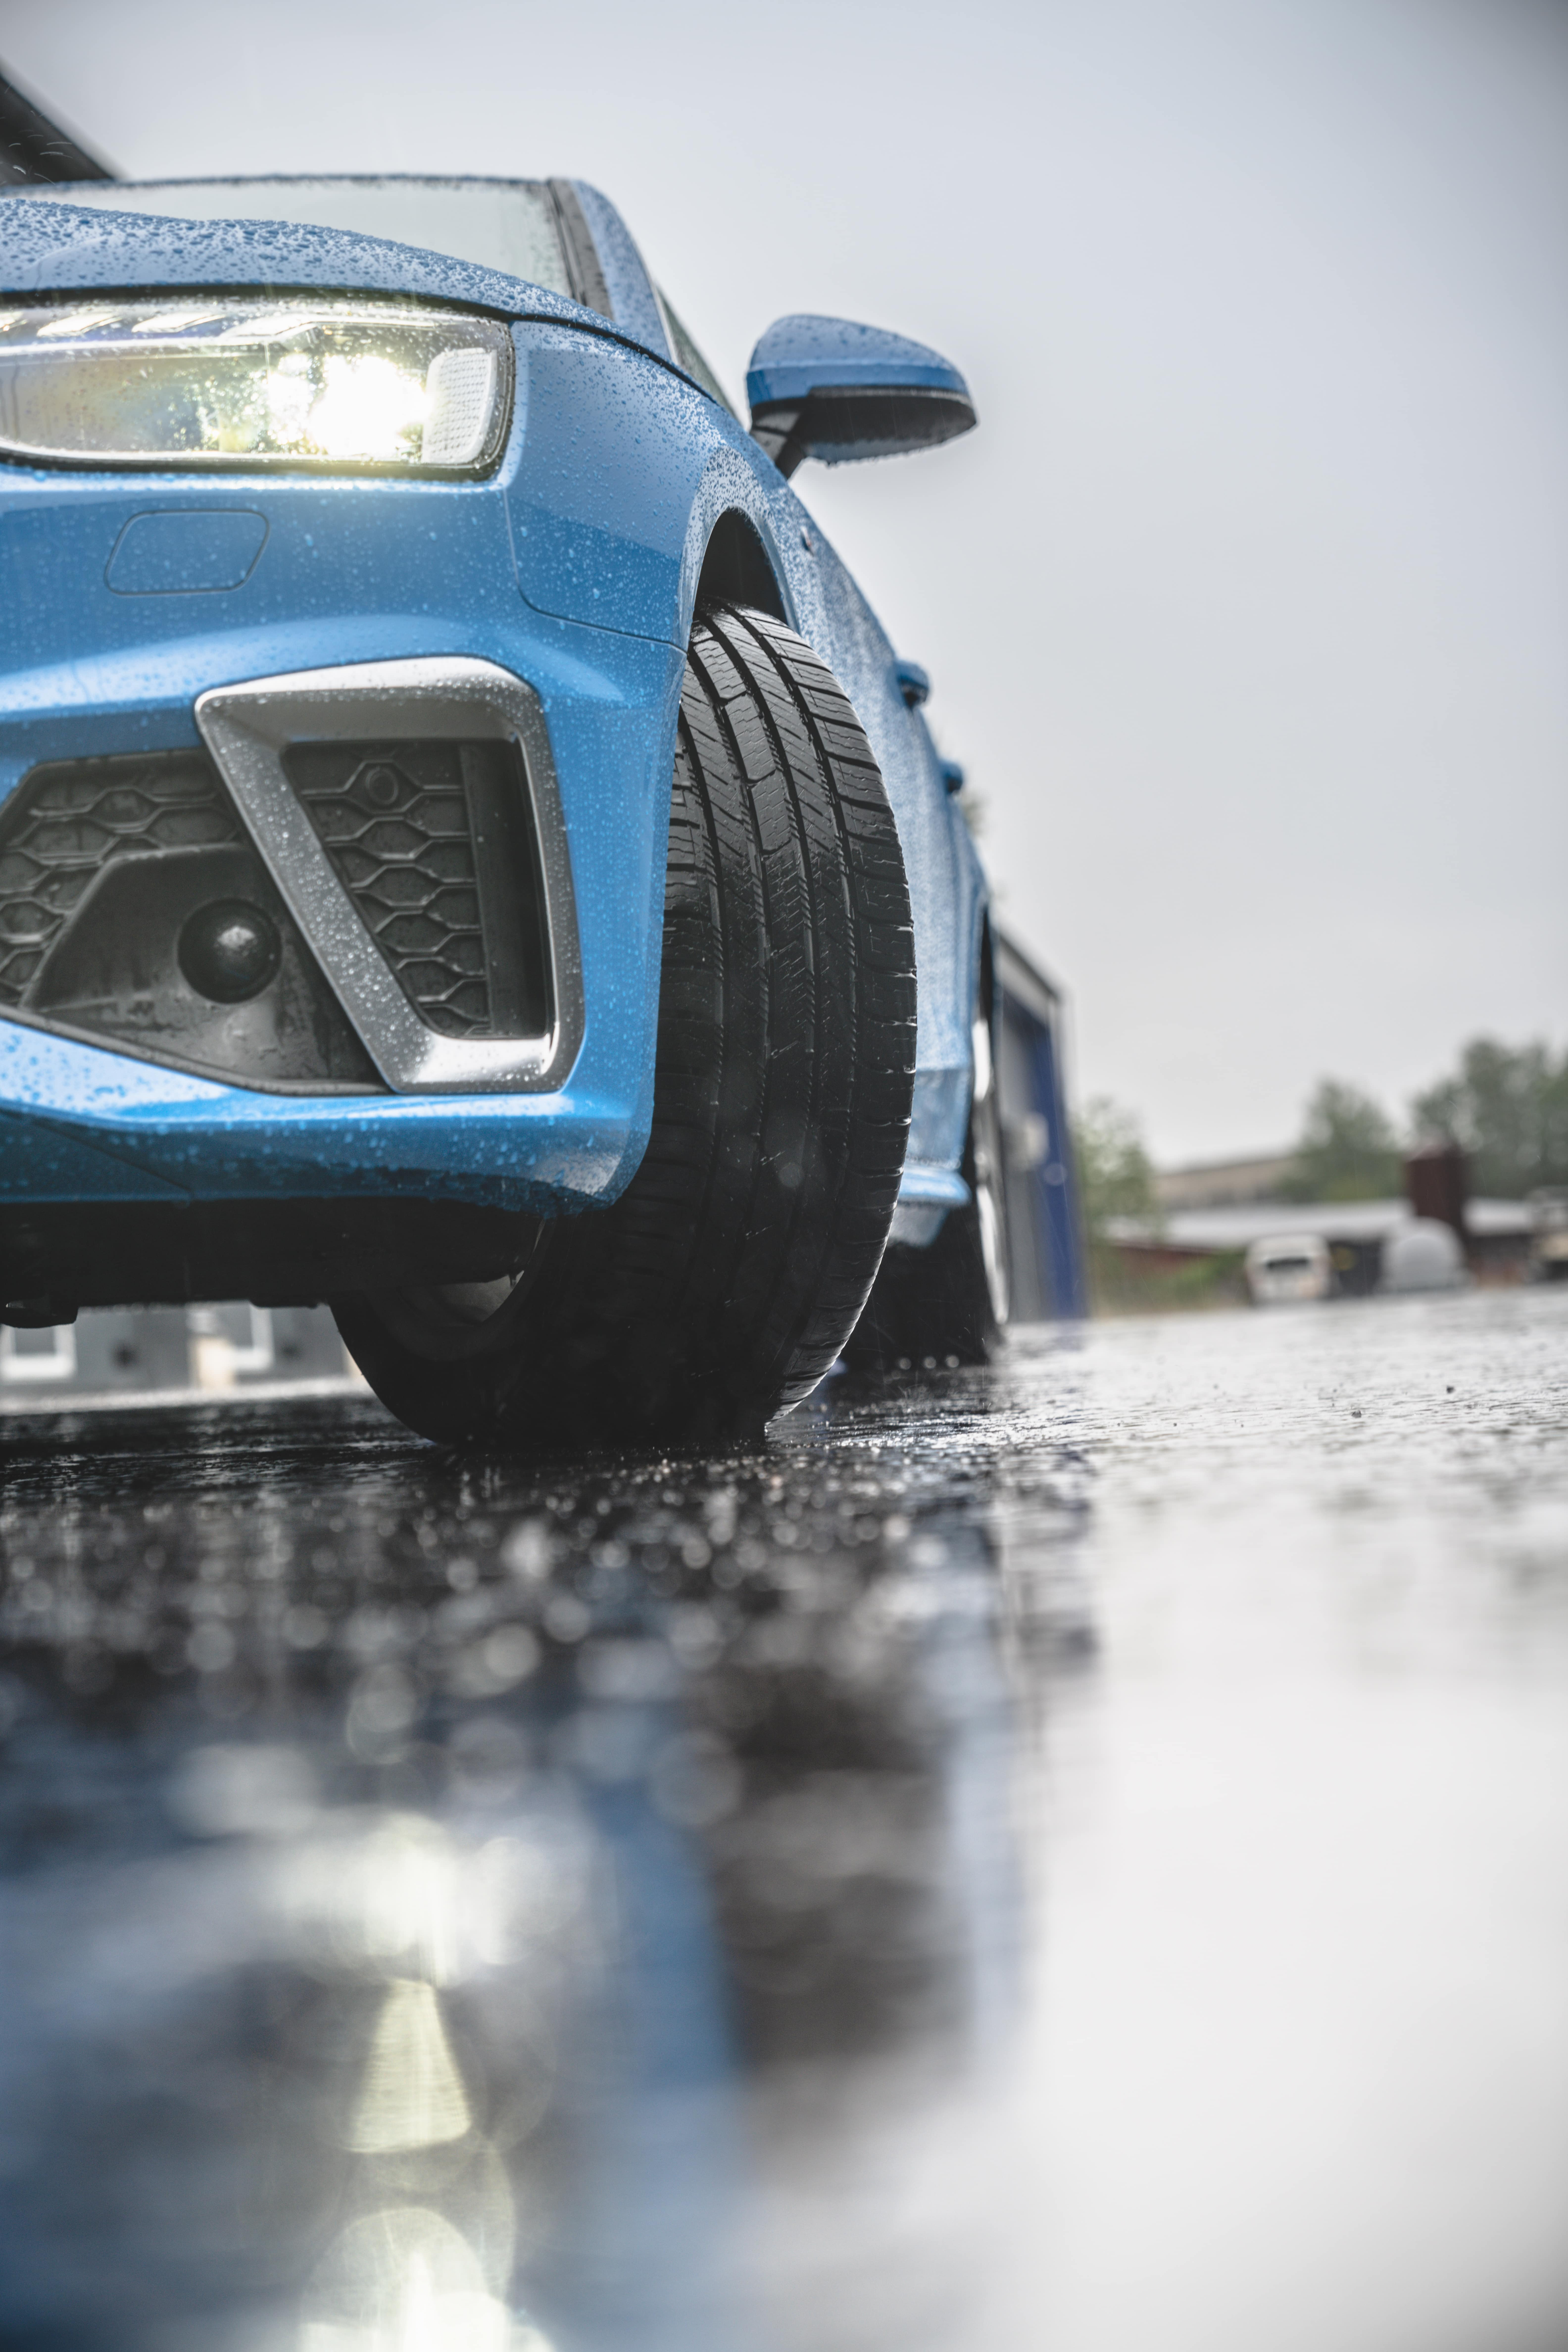 All season tires in the rain